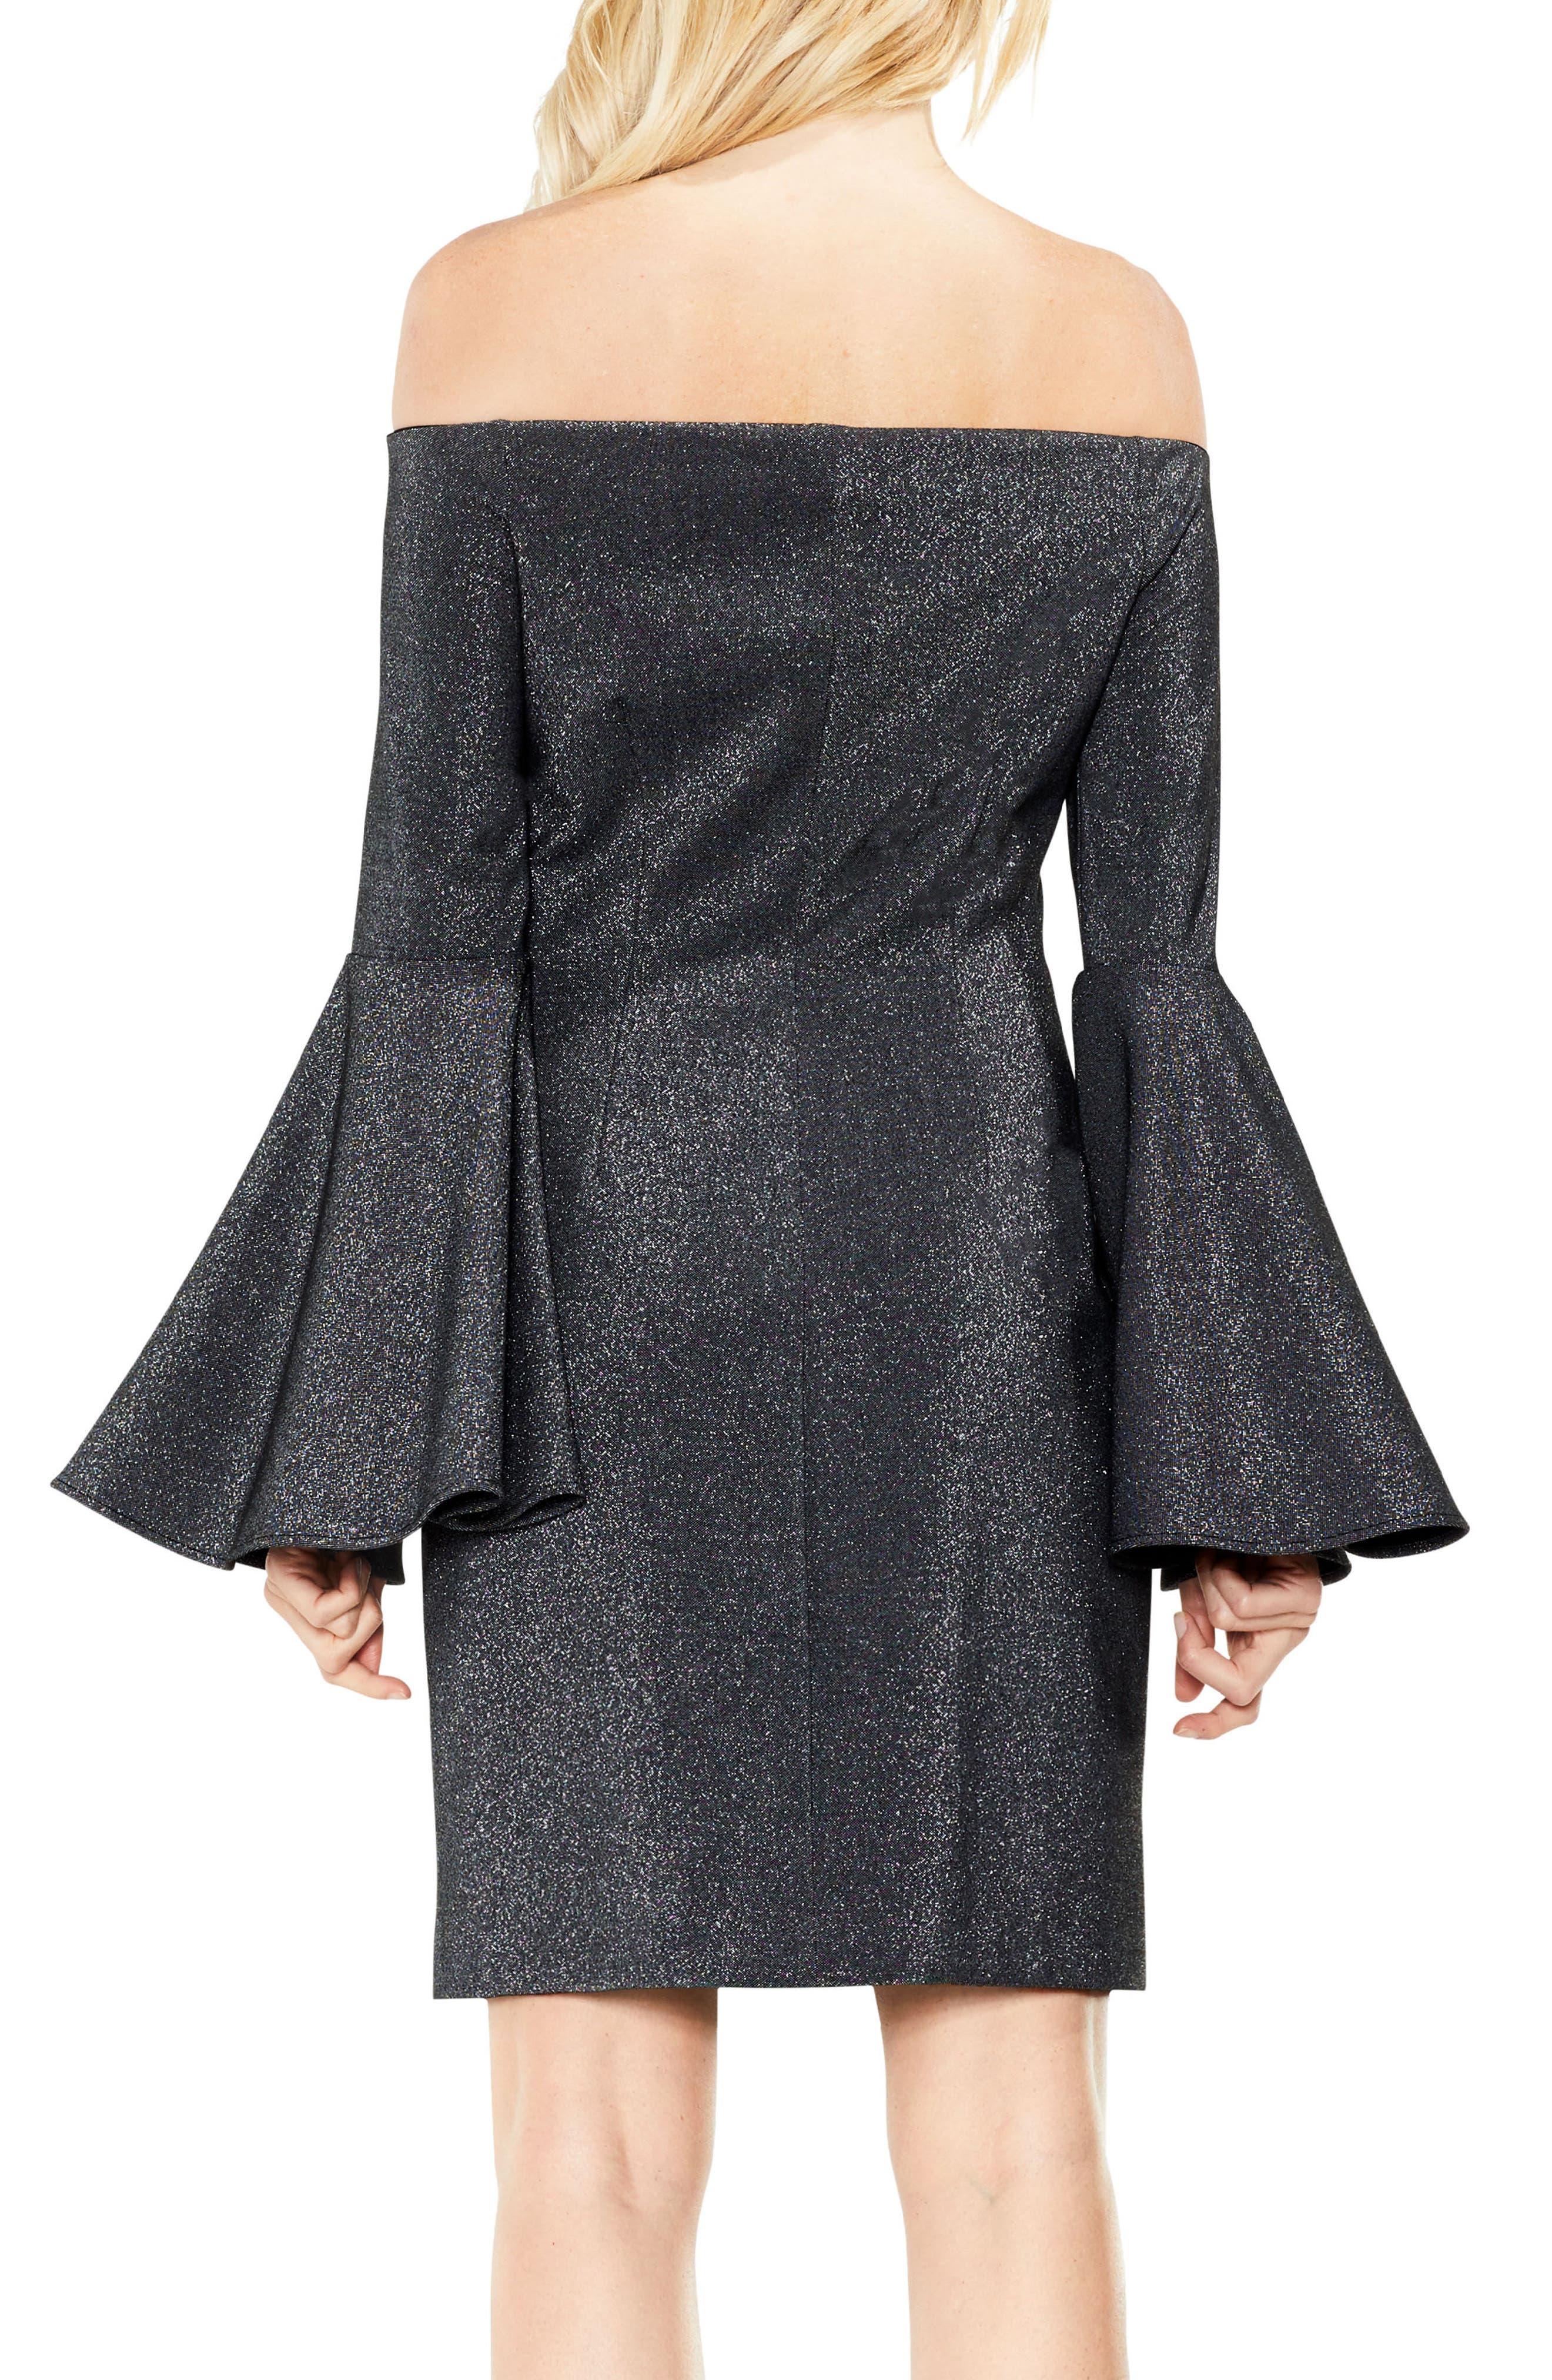 Off the Shoulder Metallic Knit Dress,                             Alternate thumbnail 3, color,                             Rich Black